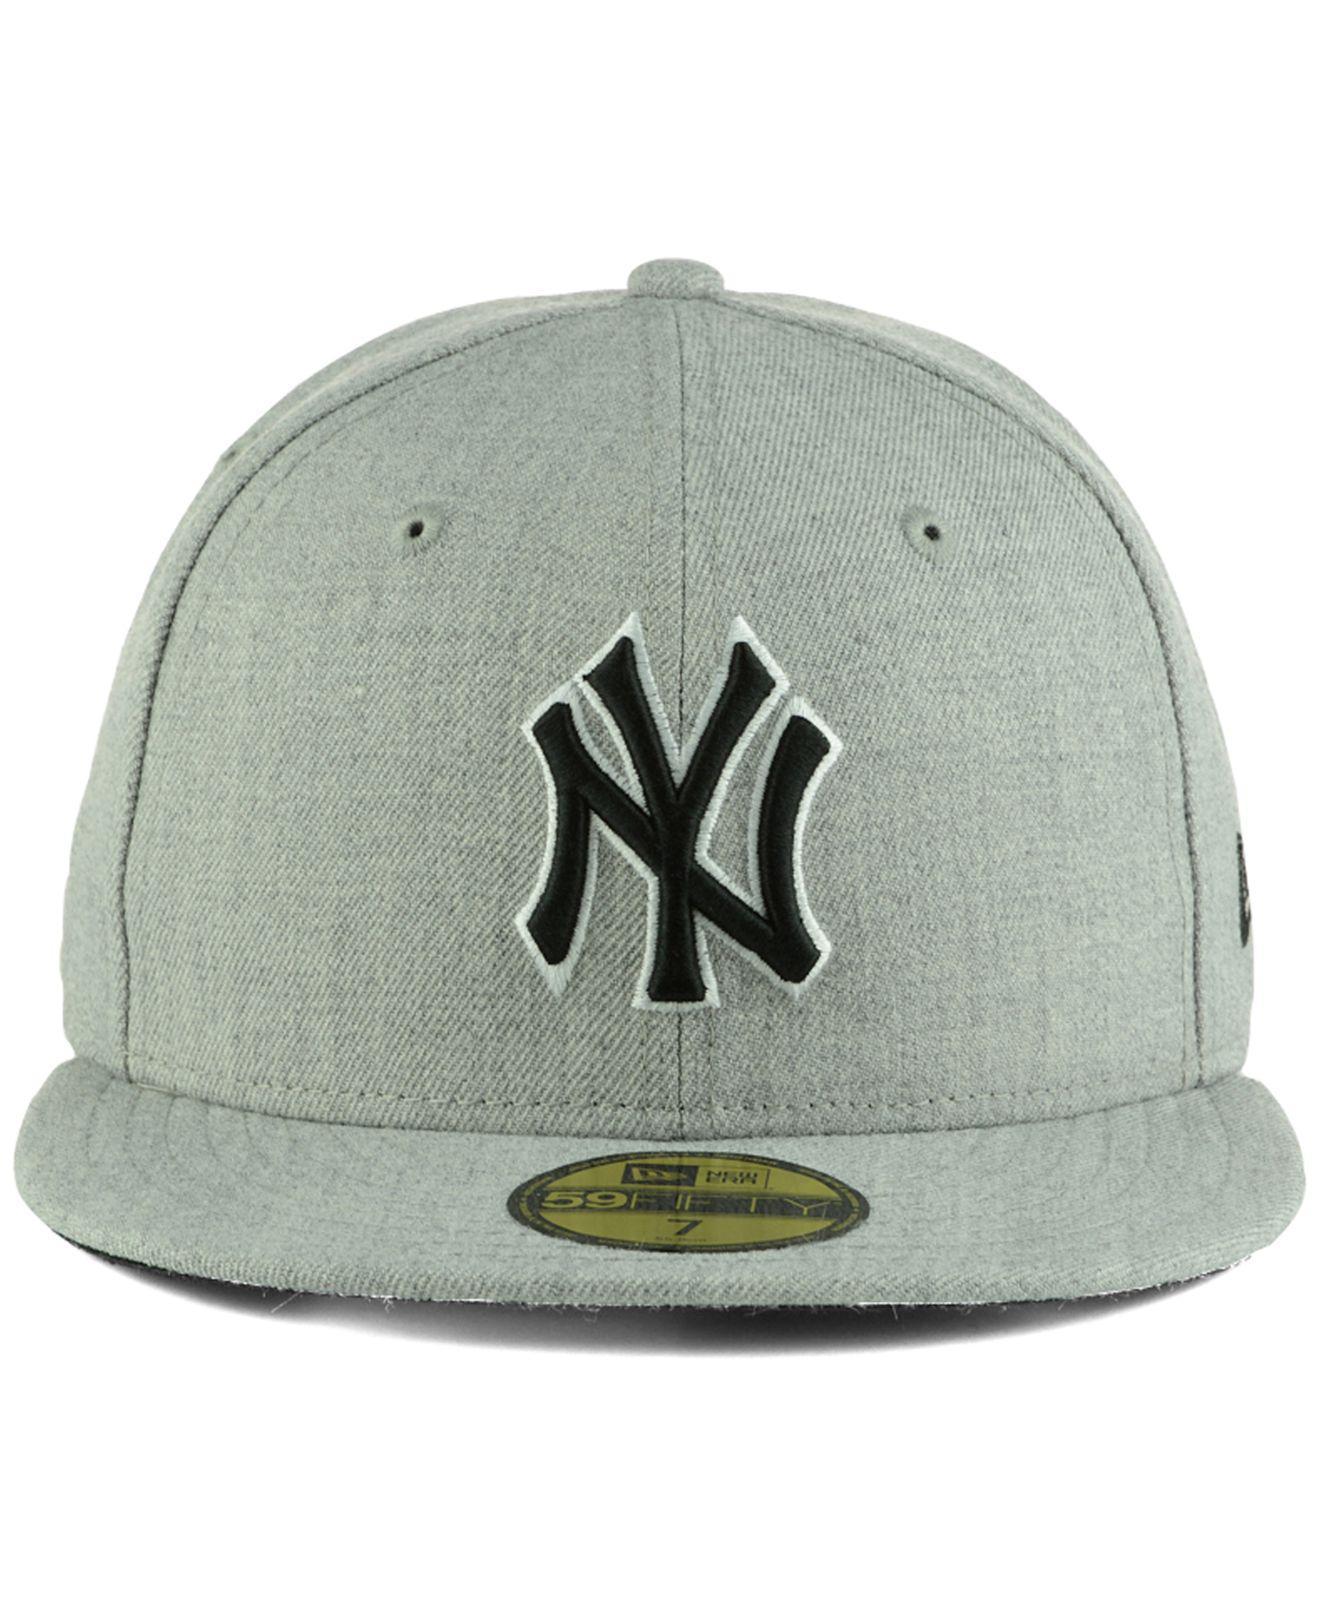 new styles d4ca4 54c0e Lyst - KTZ New York Yankees Heather Black White 59fifty Cap in Gray for Men